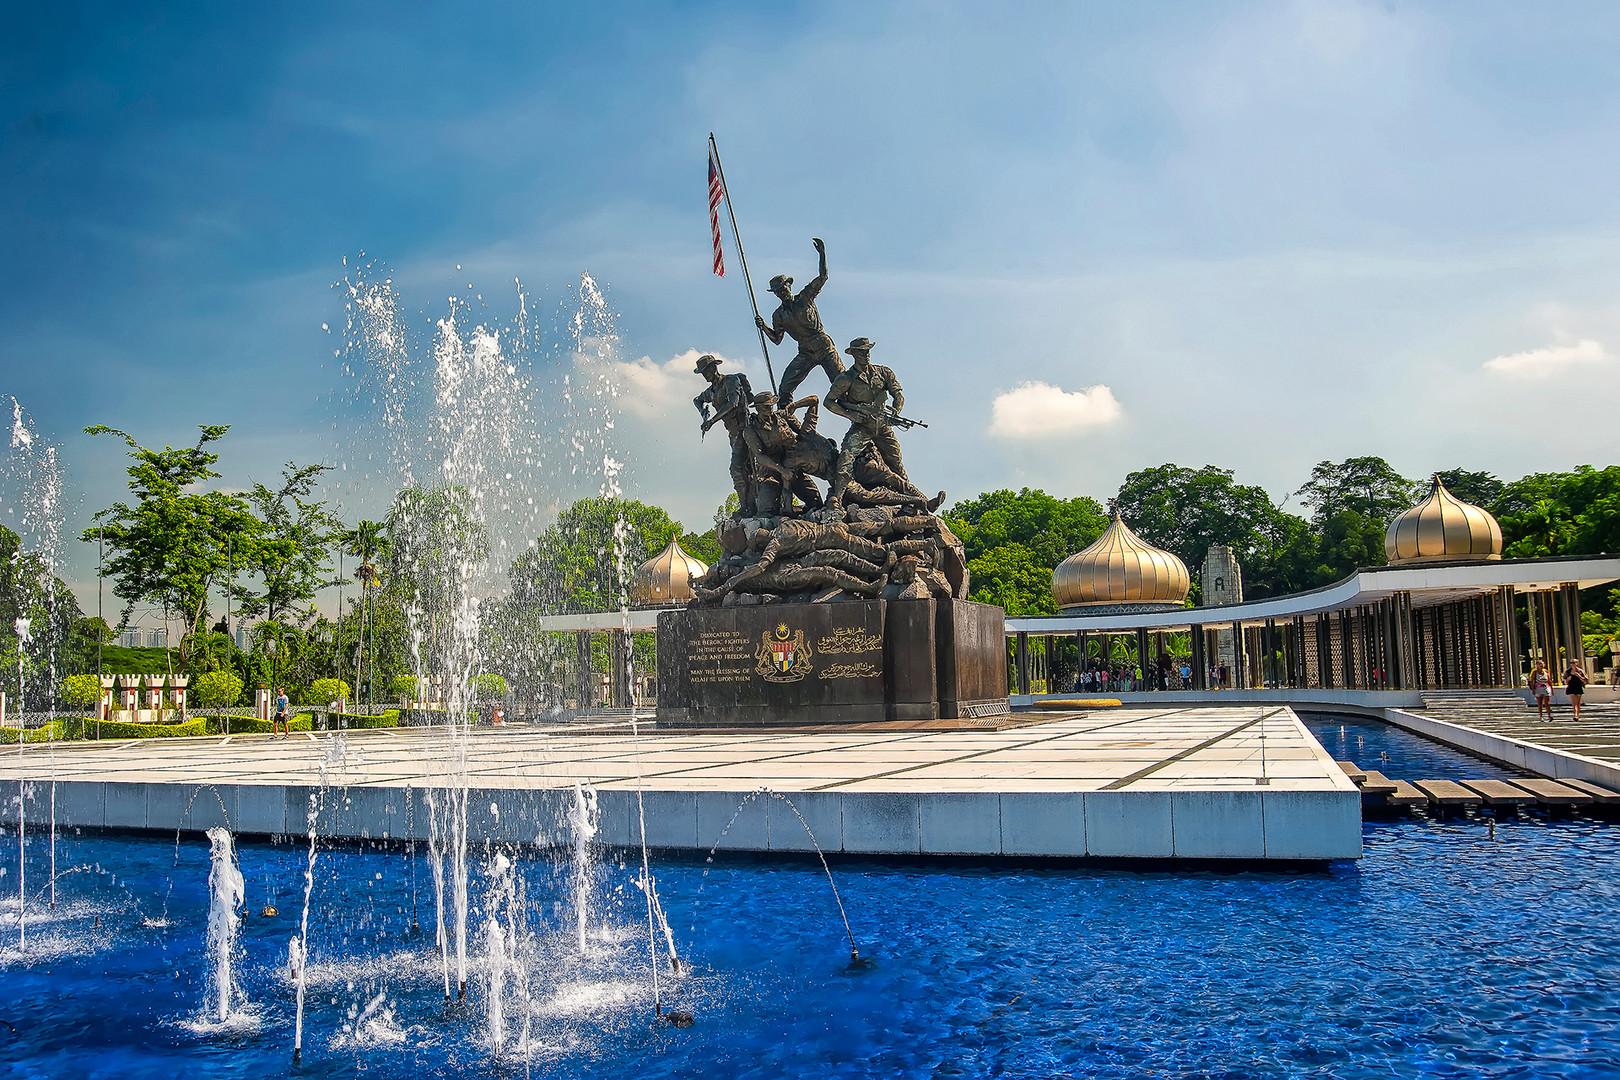 Kuala Lumpur National Monument